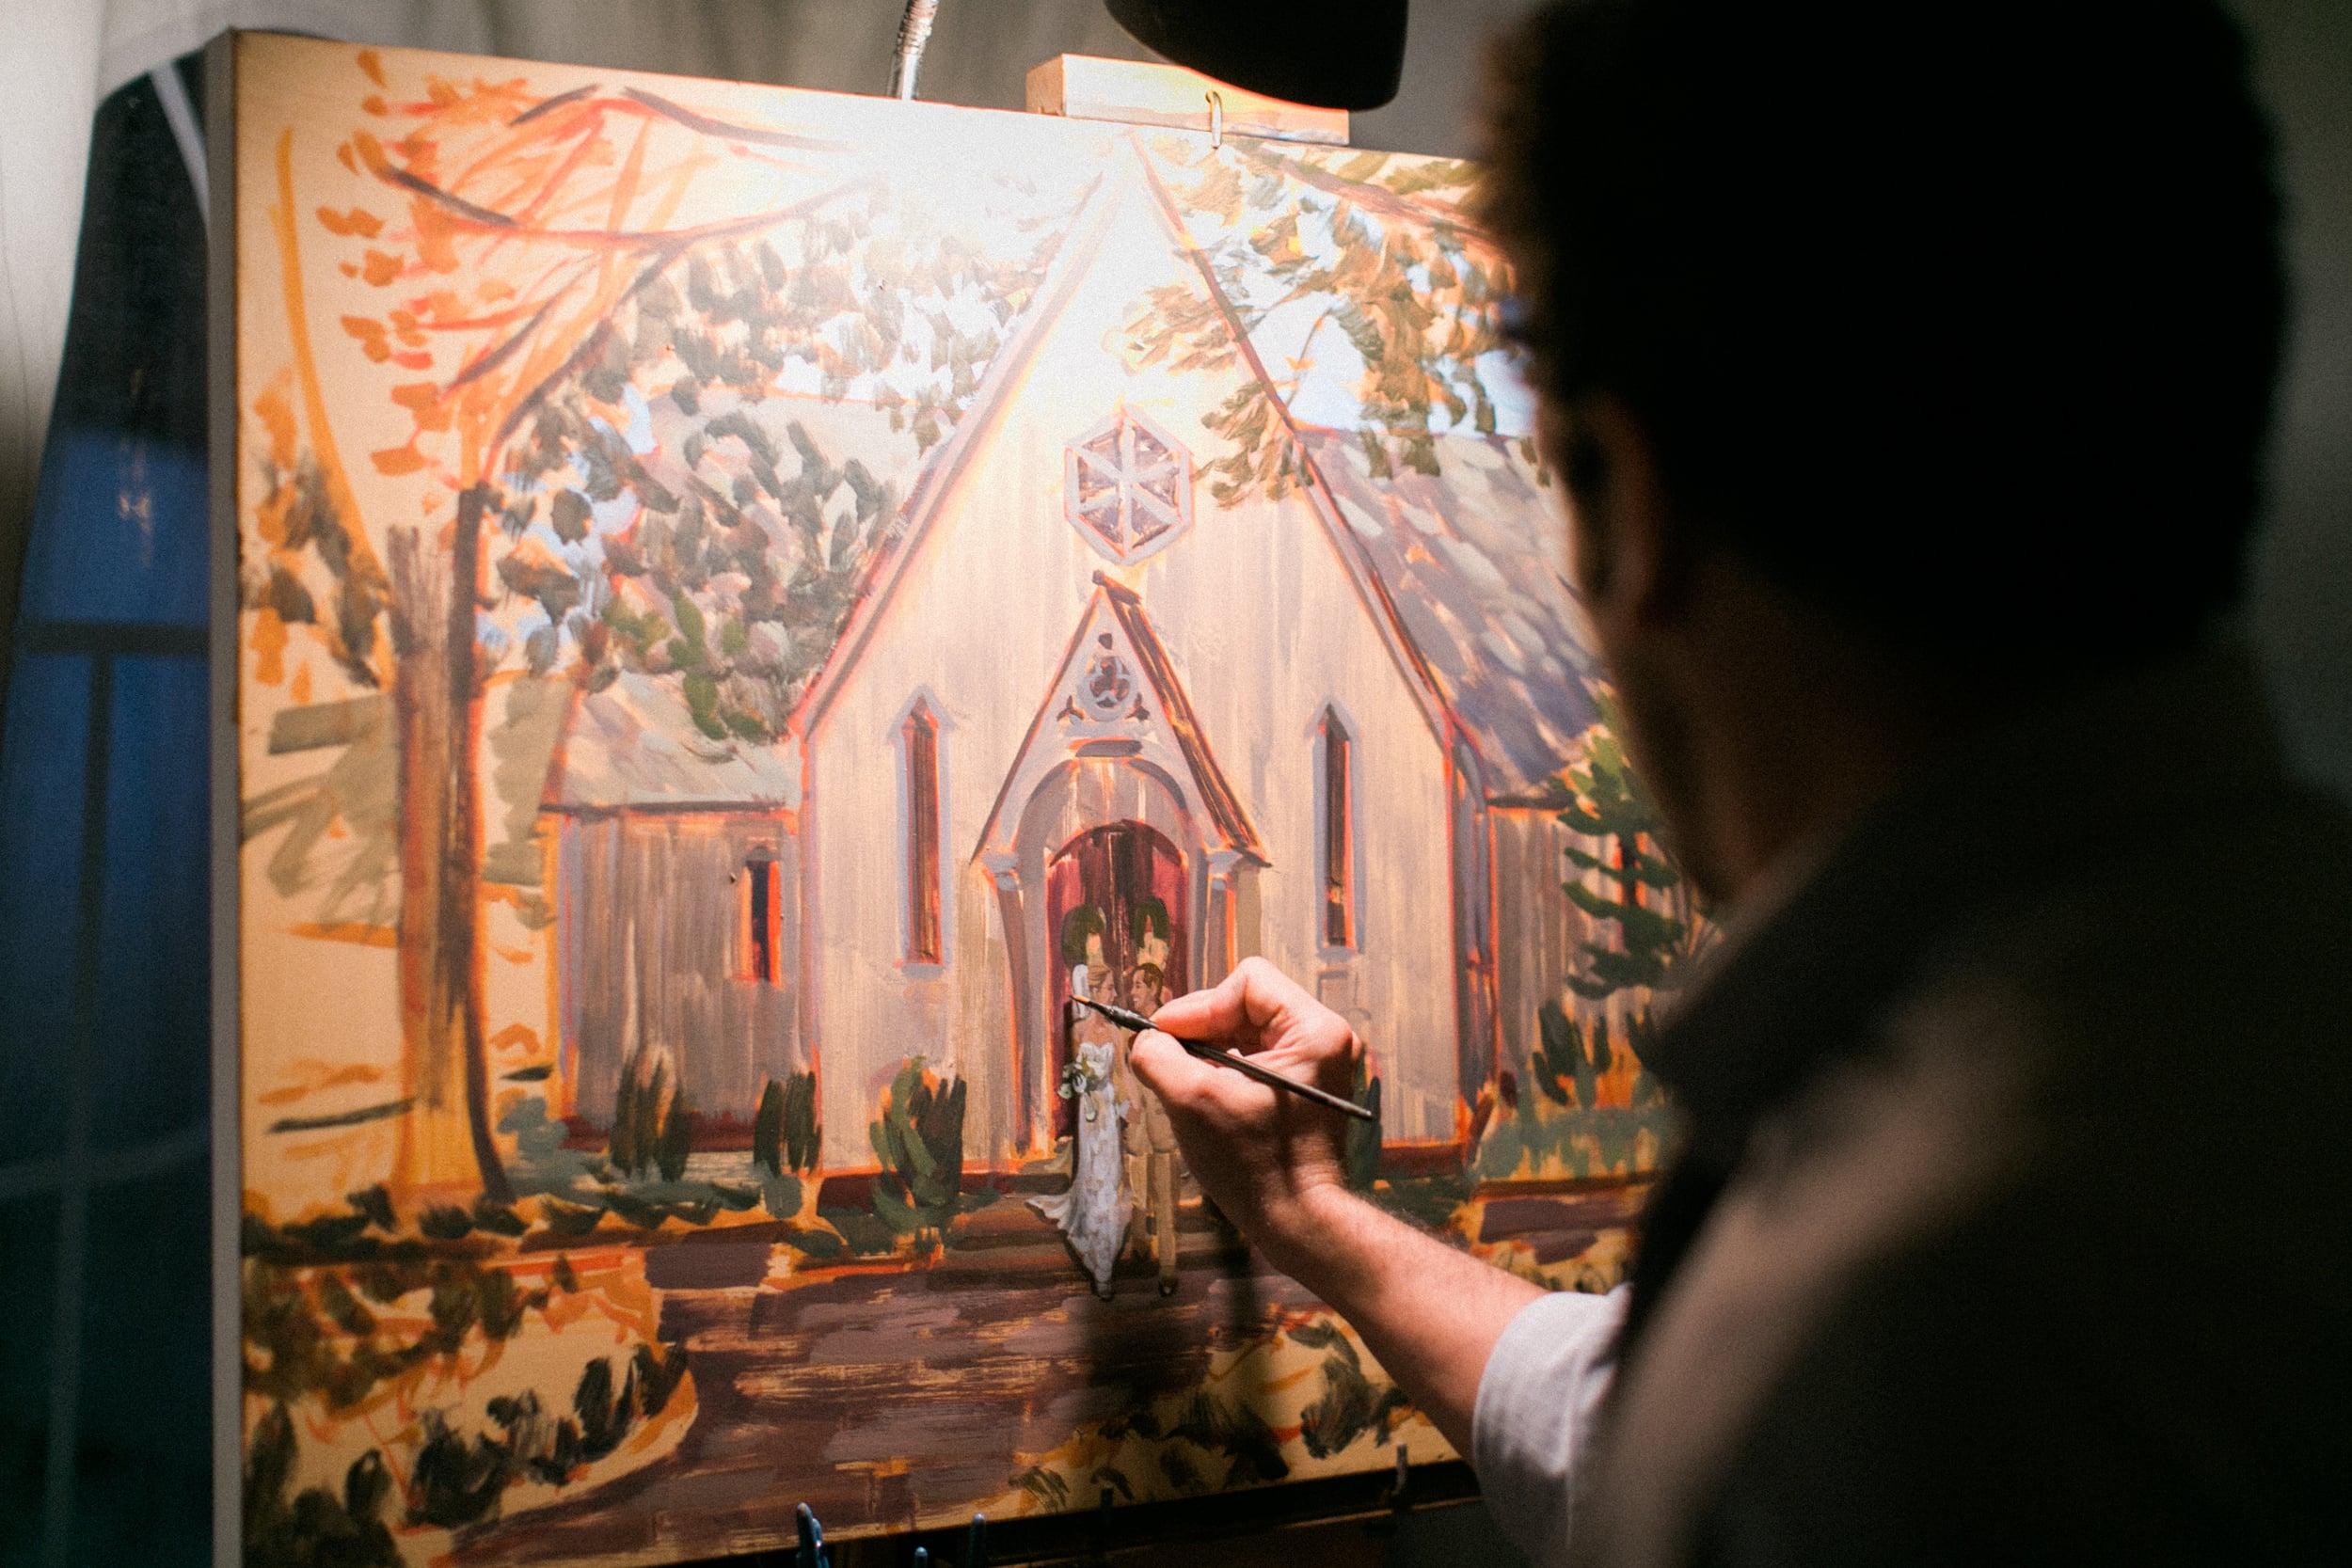 Live wedding painter, Ben Keys, capturing bride and groom's ceremony exit from Chapel.